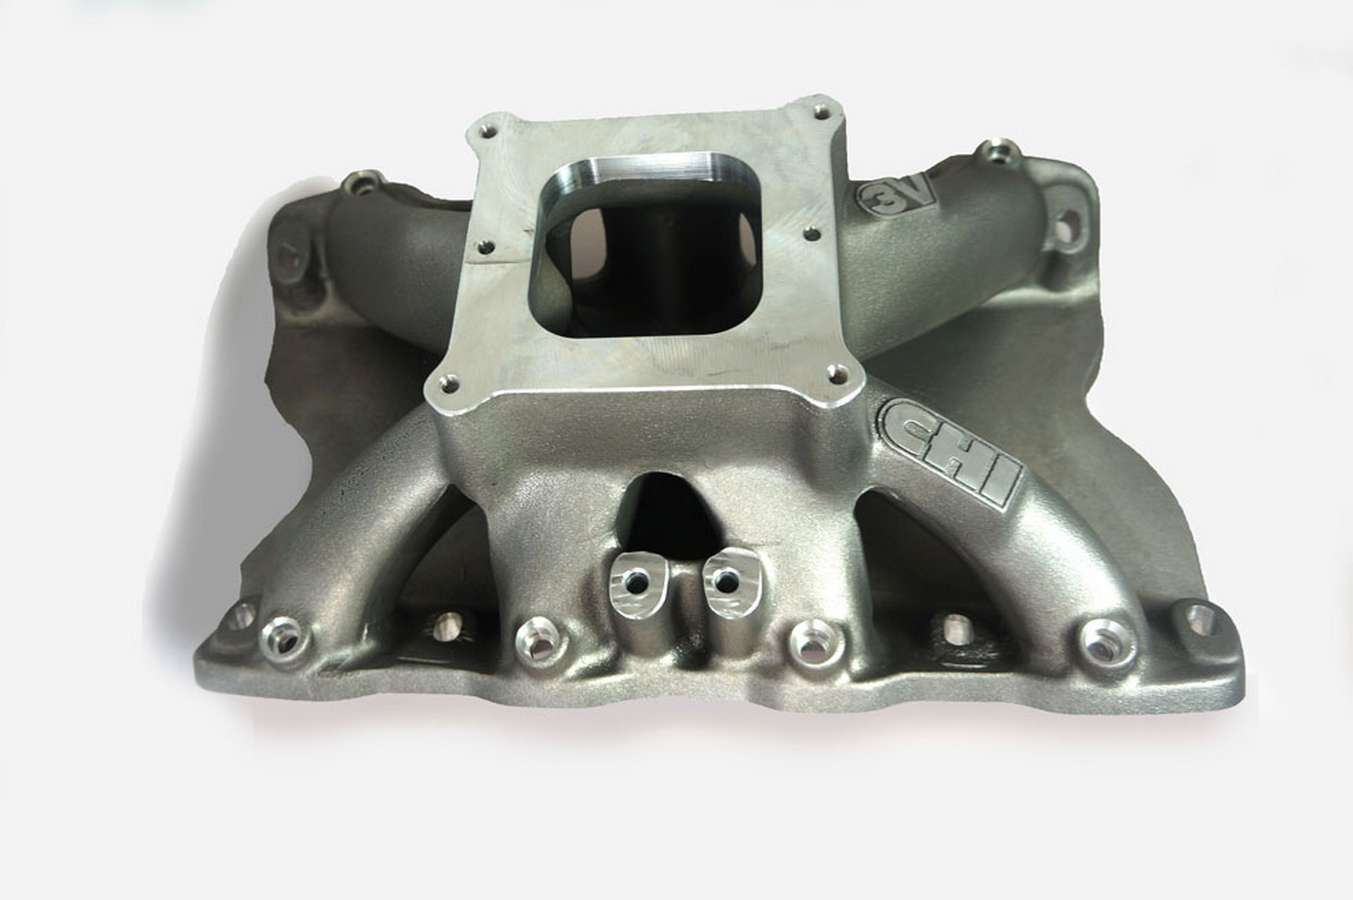 Intake Manifold - 3V 208cc Cleveland 9.2